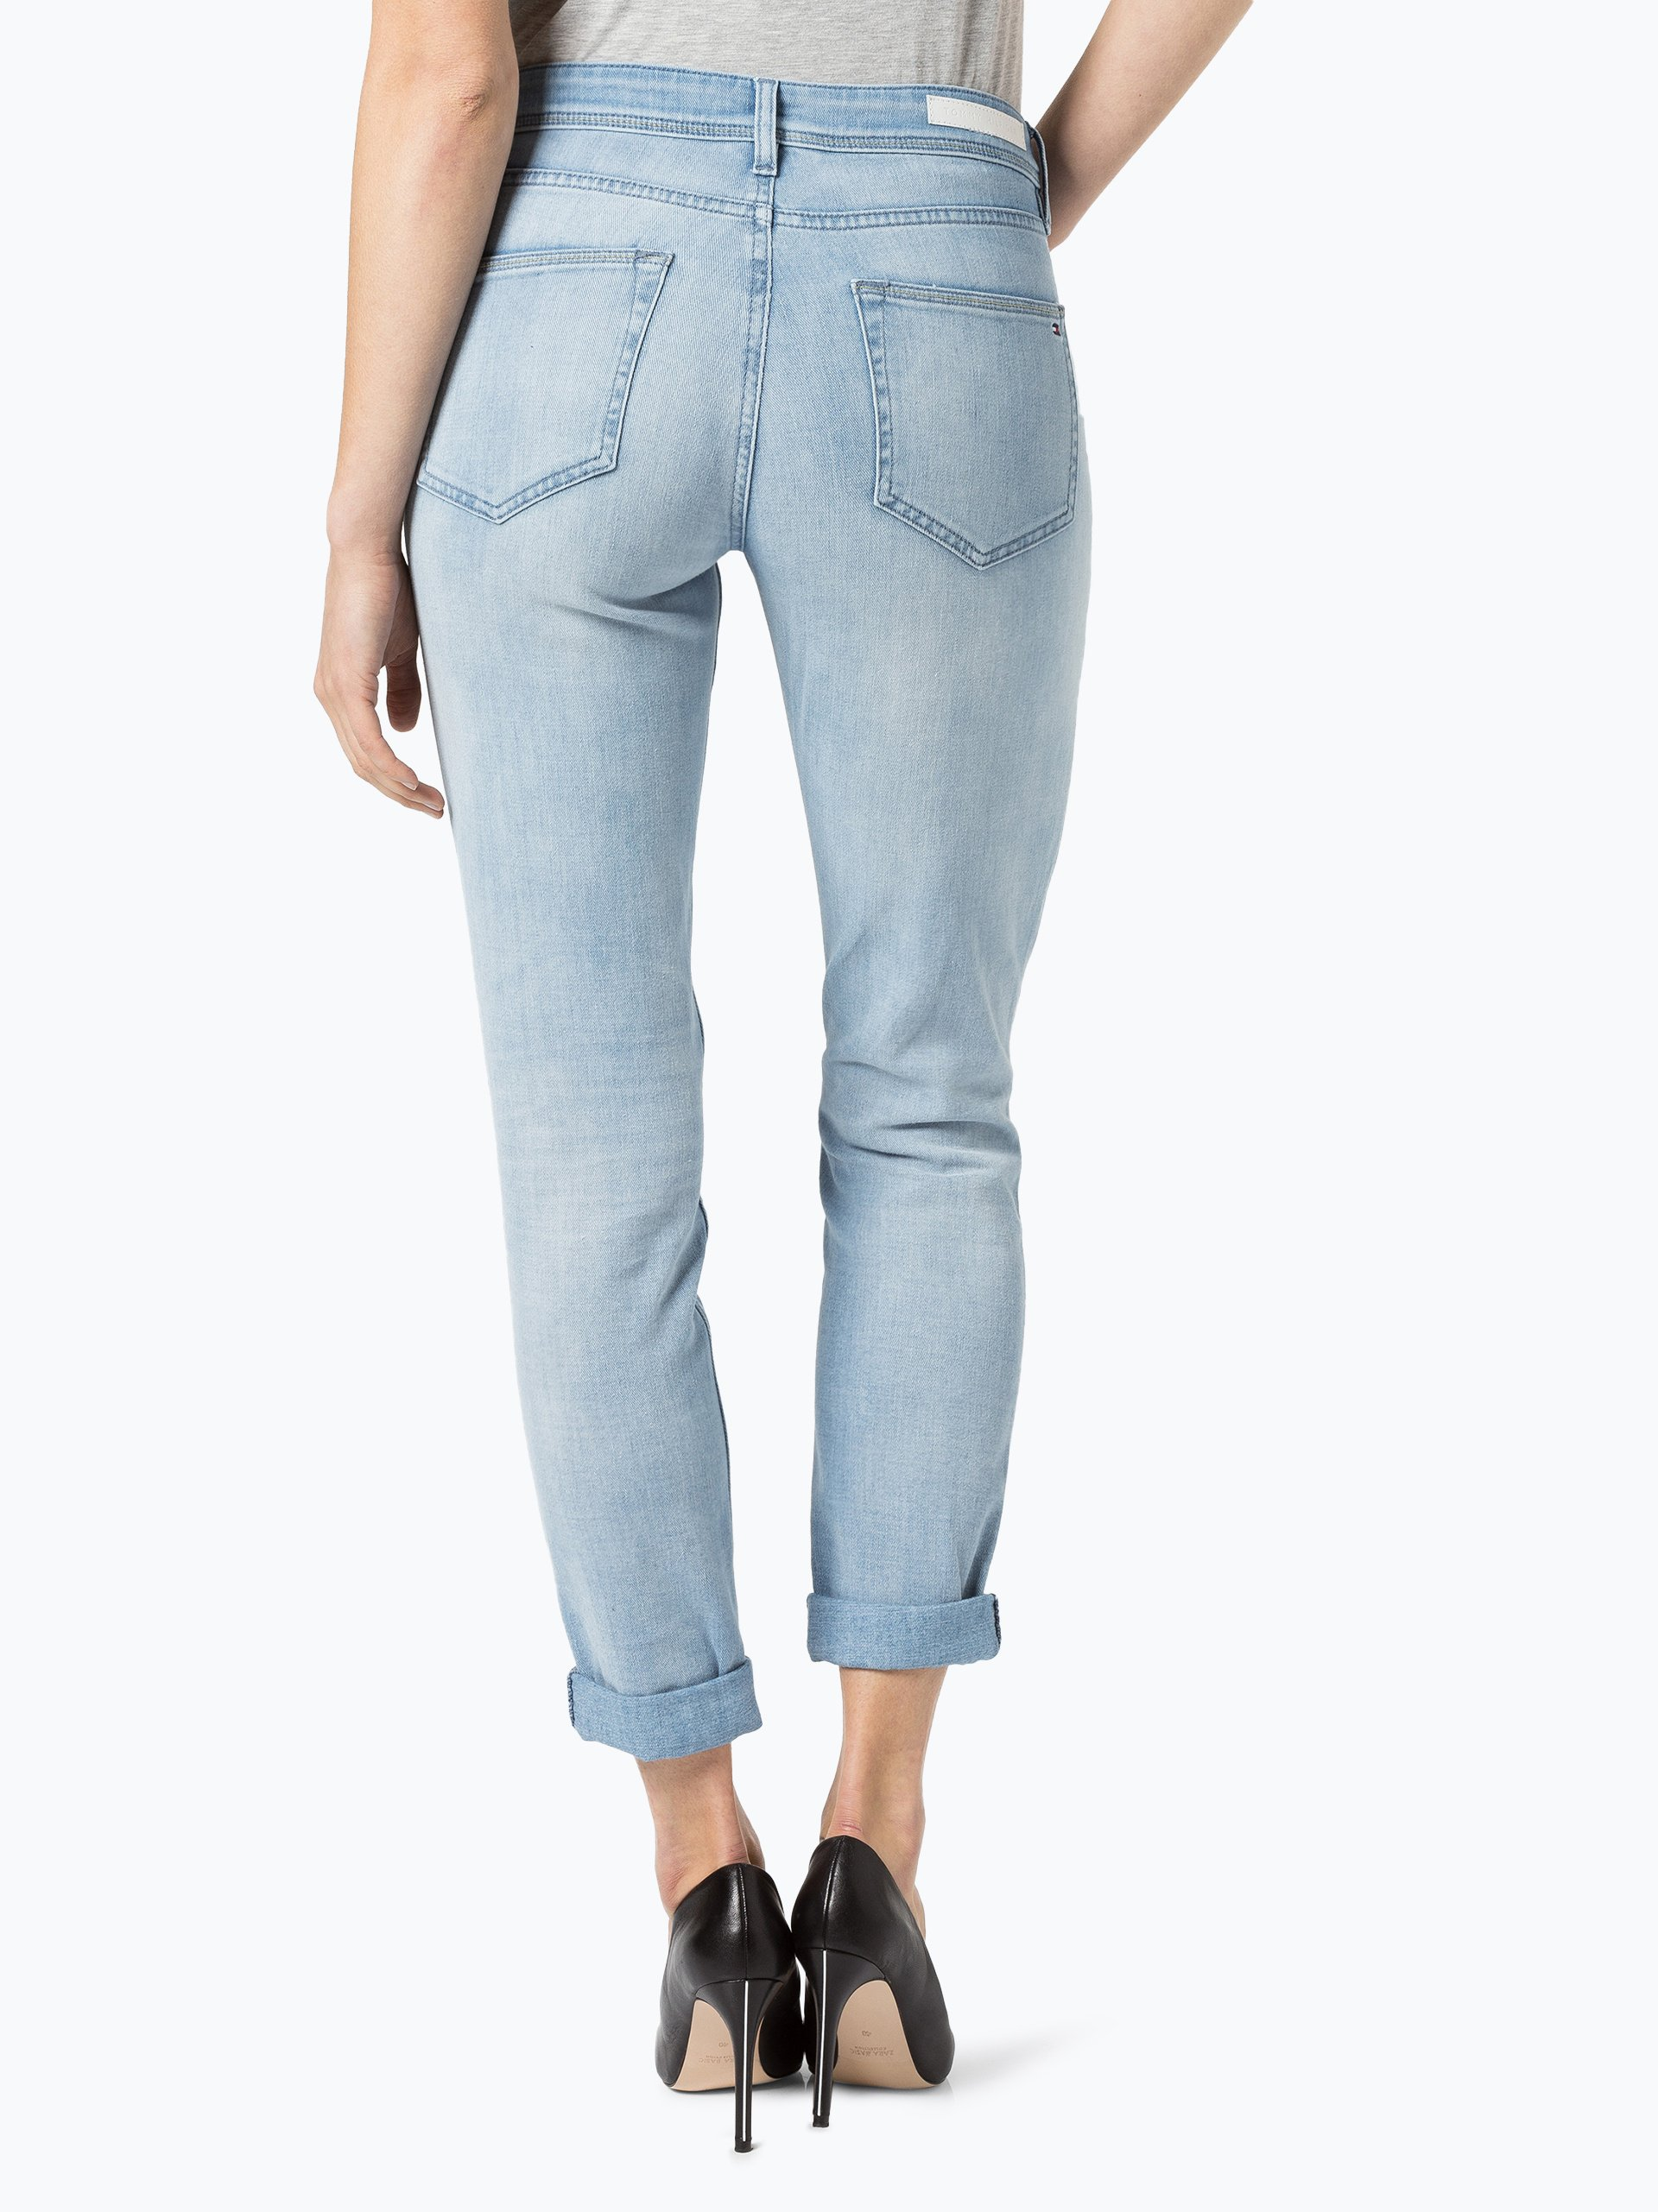 Tommy Hilfiger Damen Jeans - Griffin